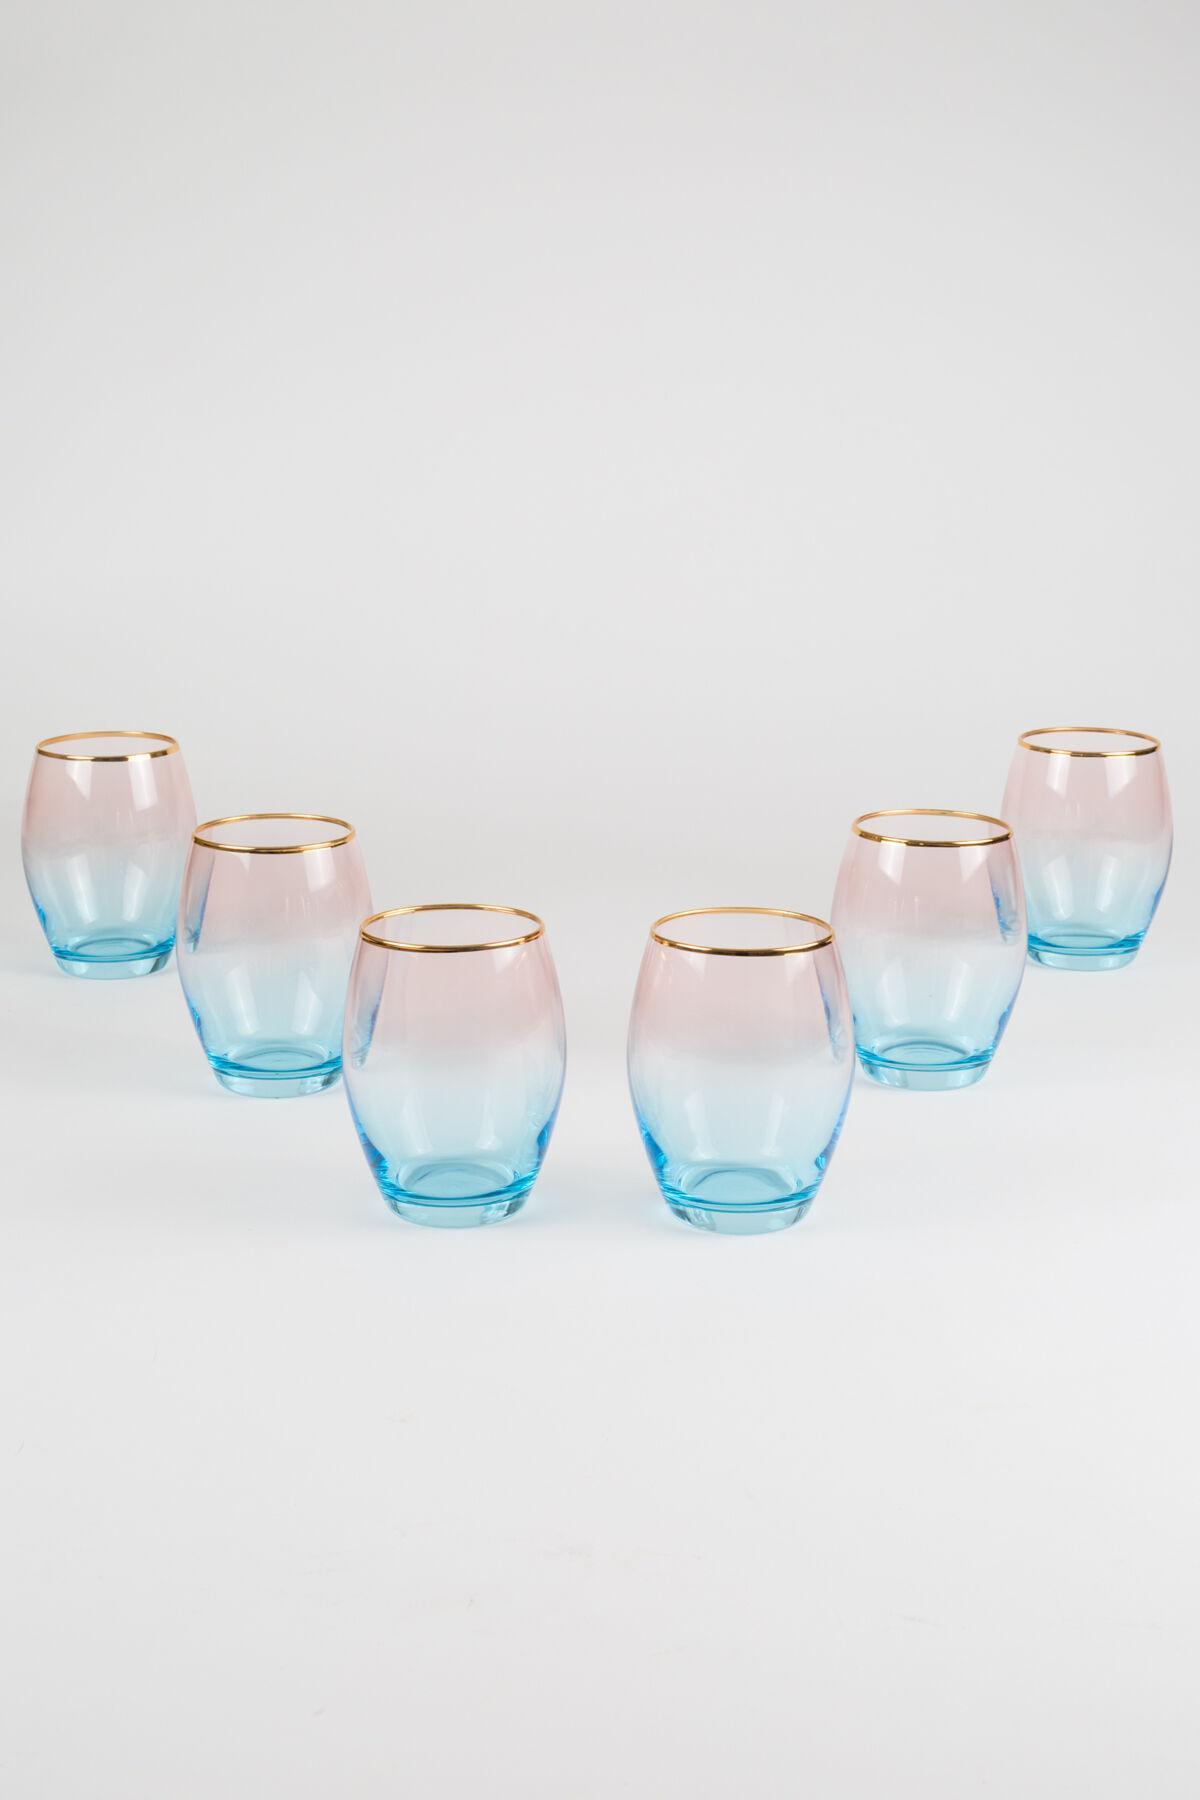 Rakle 390 cc Serenade 6'lı Meşrubat Bardağı Seti - Markalar